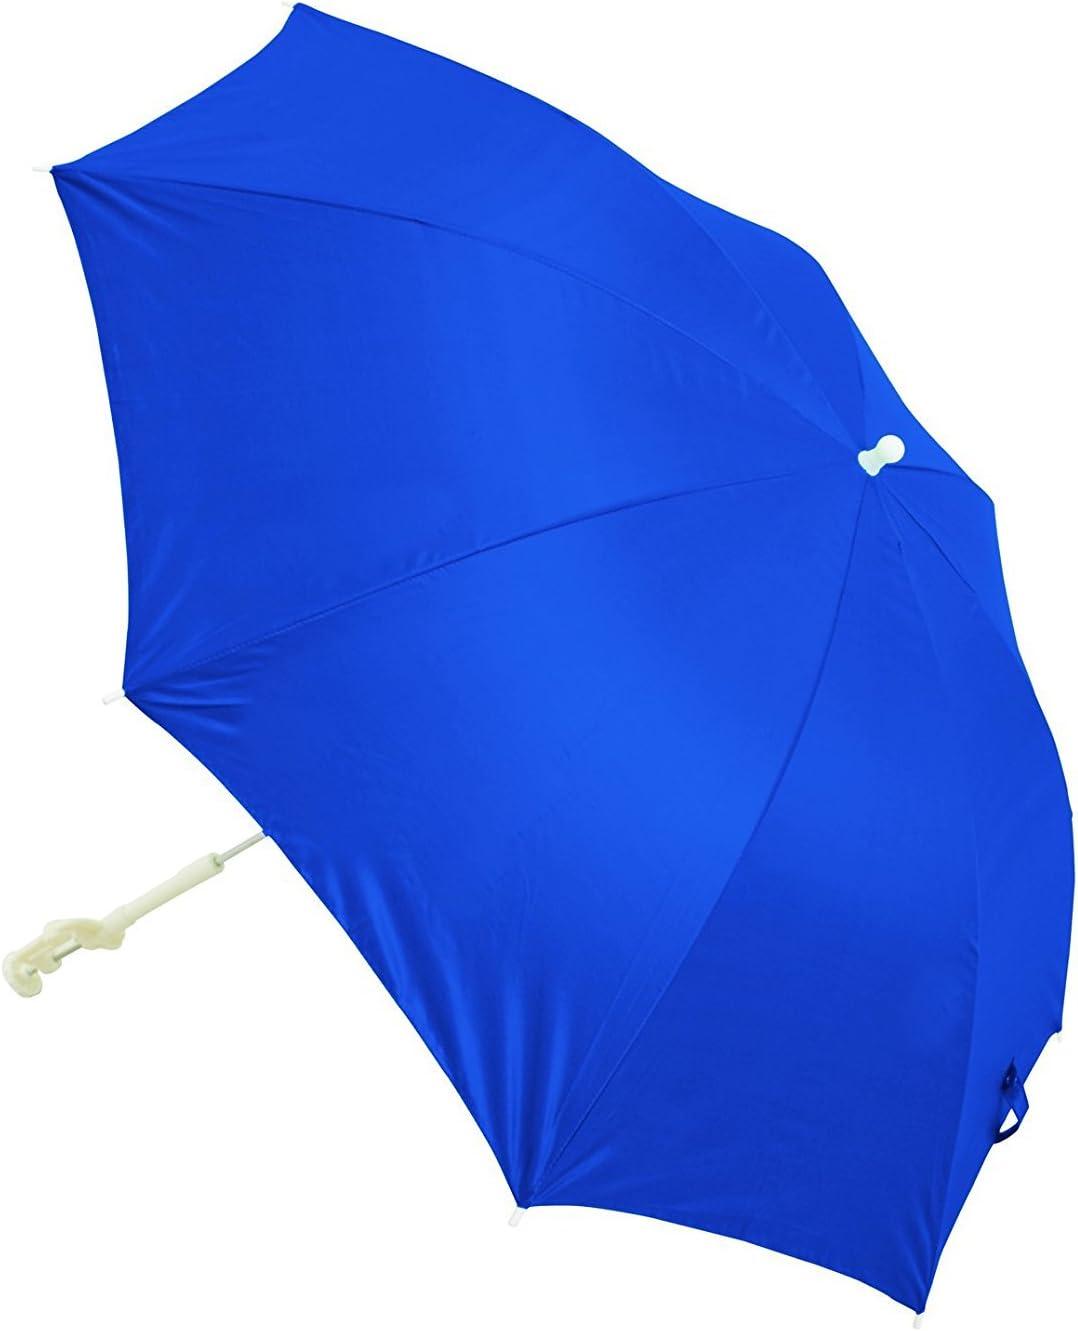 Clamp-On Patio Beach Chair Sun Block Shade Umbrella Canopy Outdoor 50+SPF